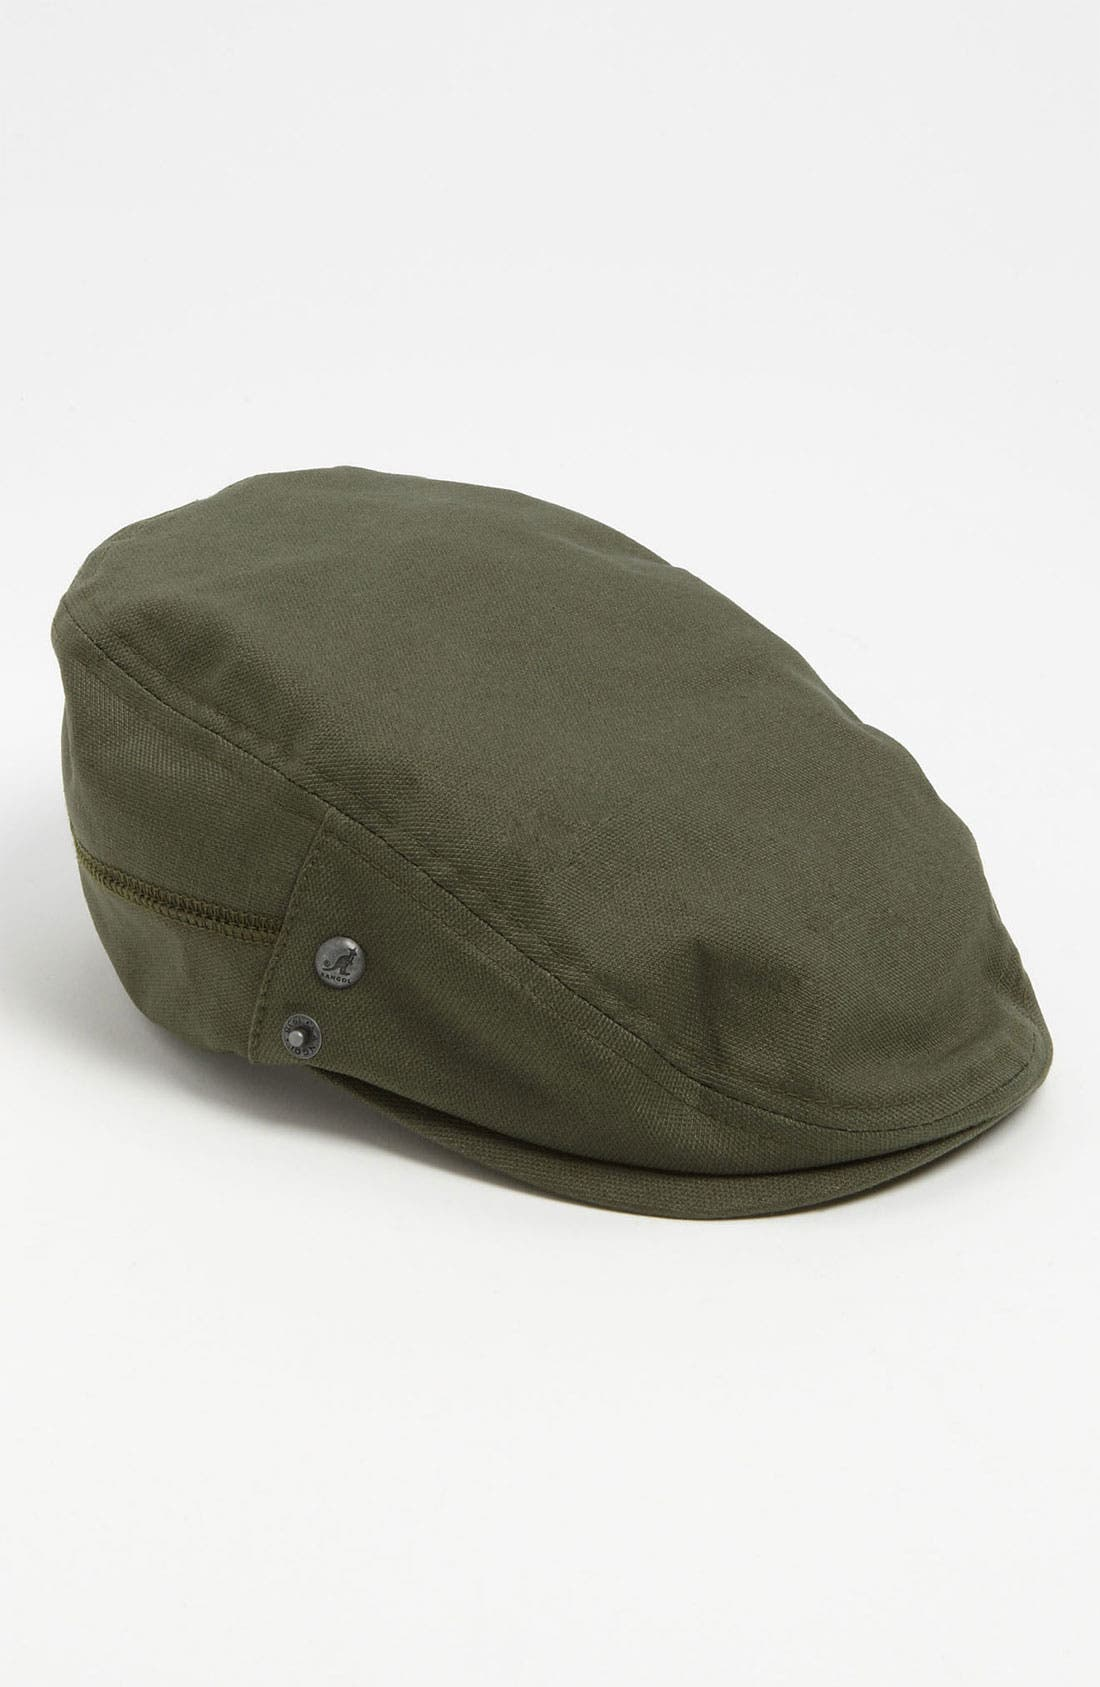 Main Image - Kangol 'Military' Driving Cap